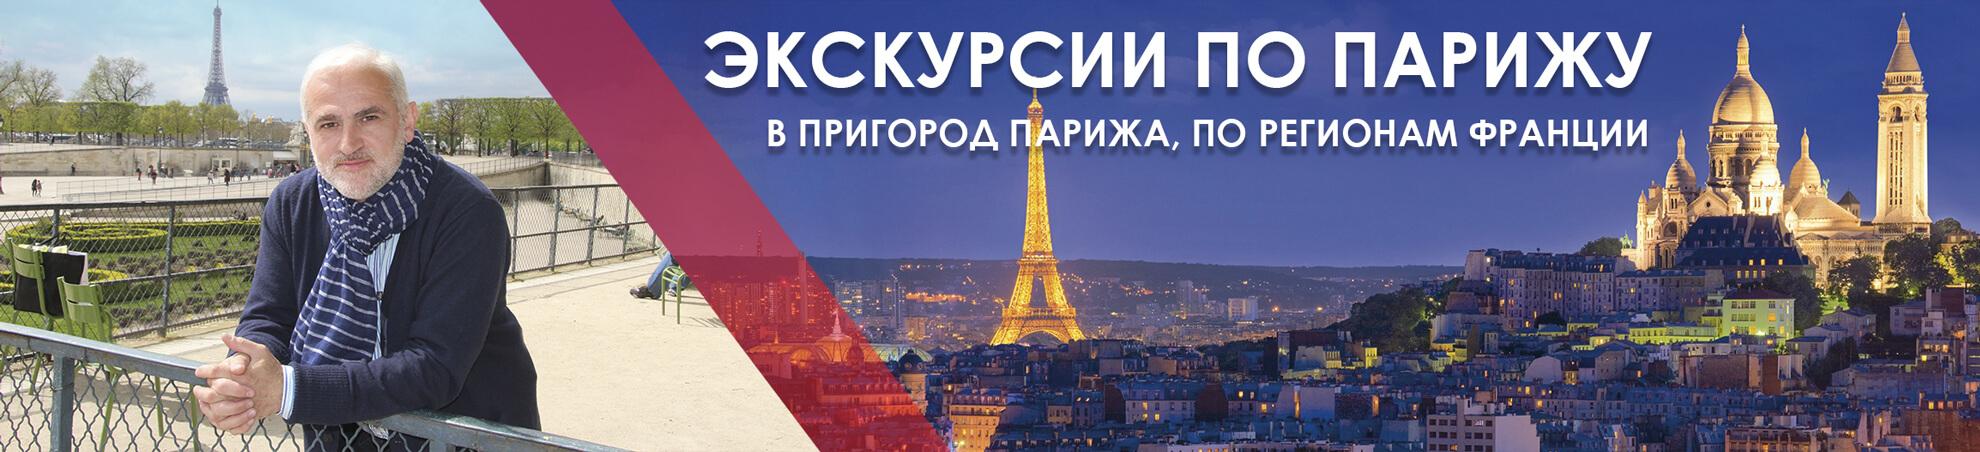 Экскурсии во Франции